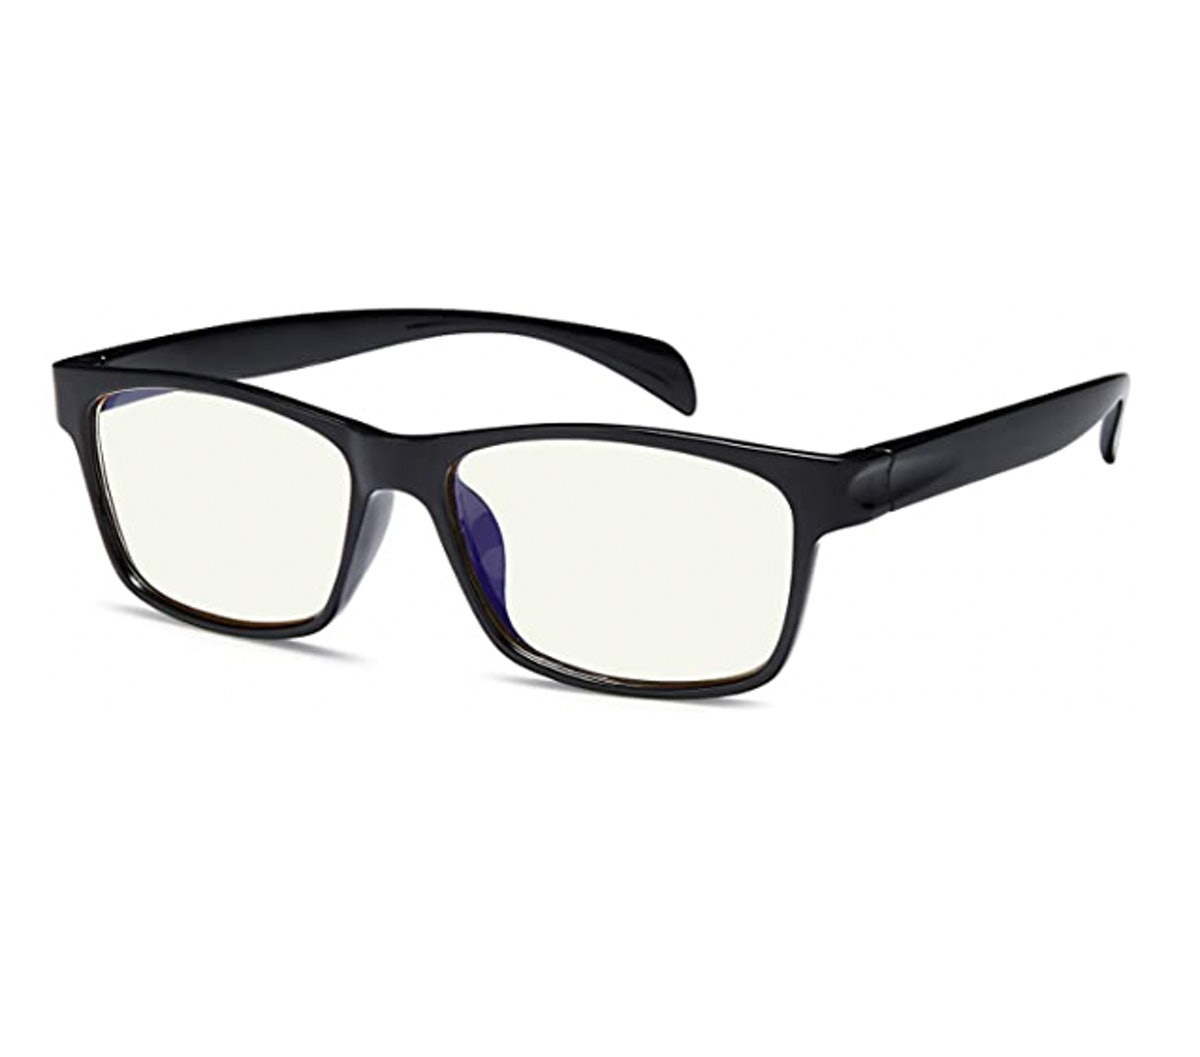 Gamma Ray Blue Light-Blocking Glasses